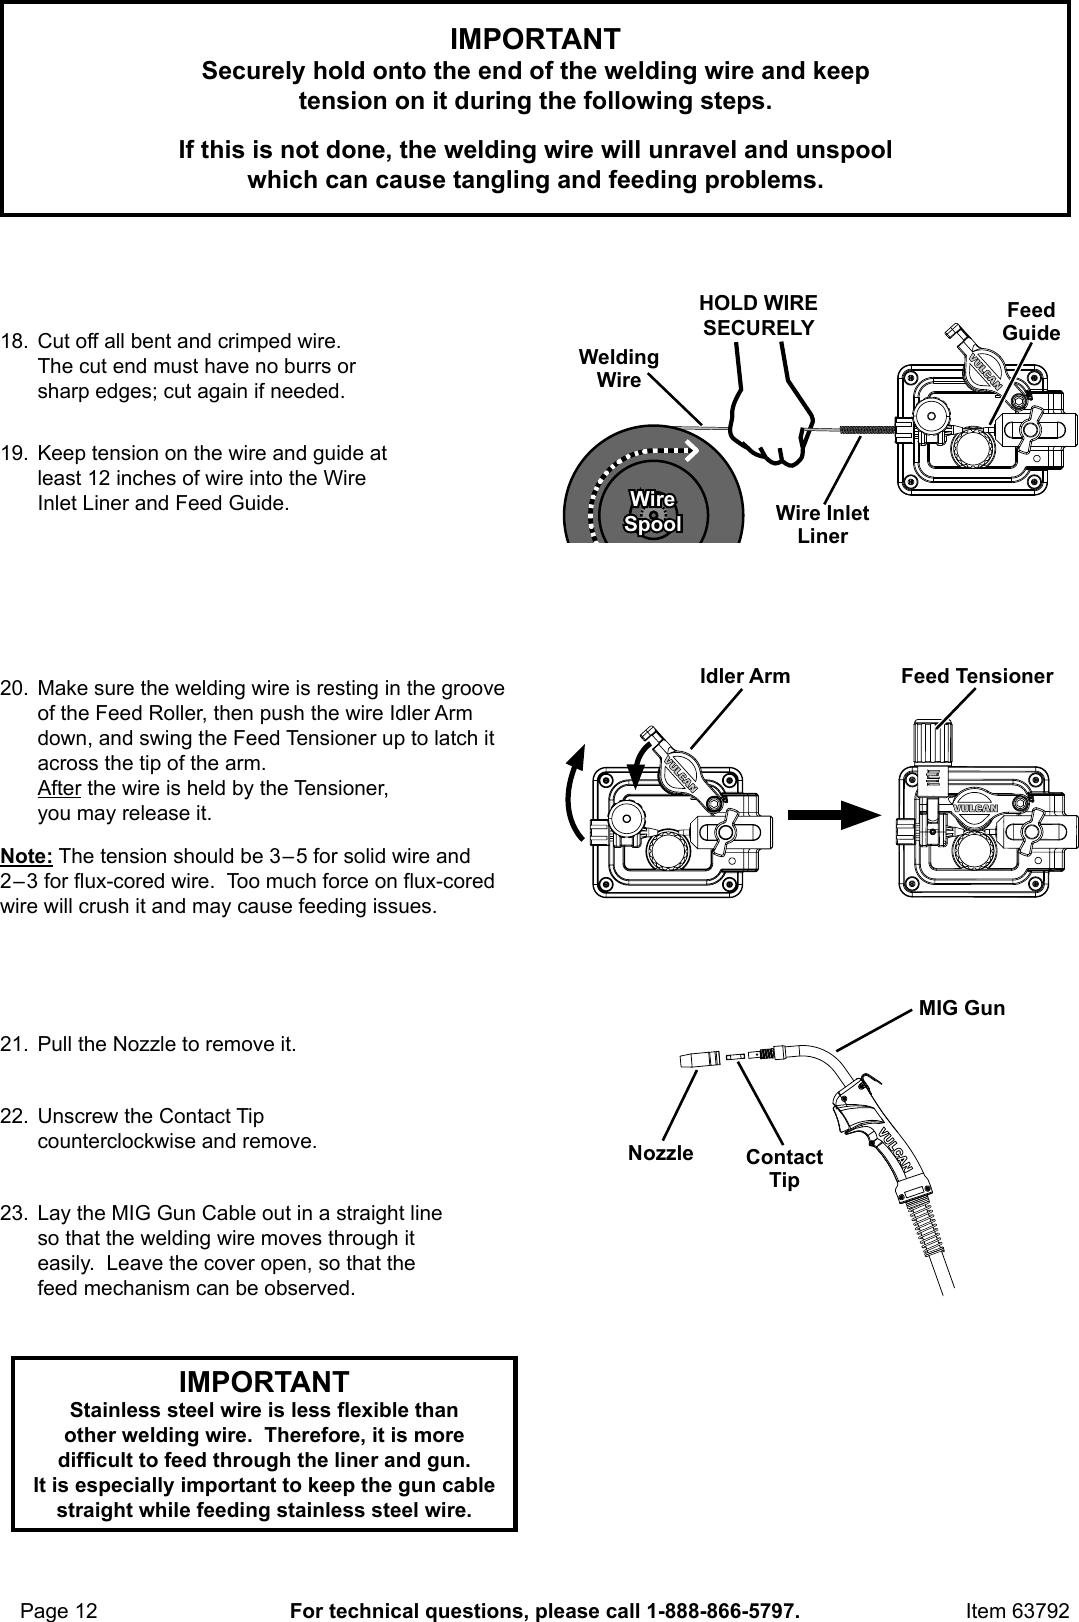 Manual For The 63792 180a Mig Gun